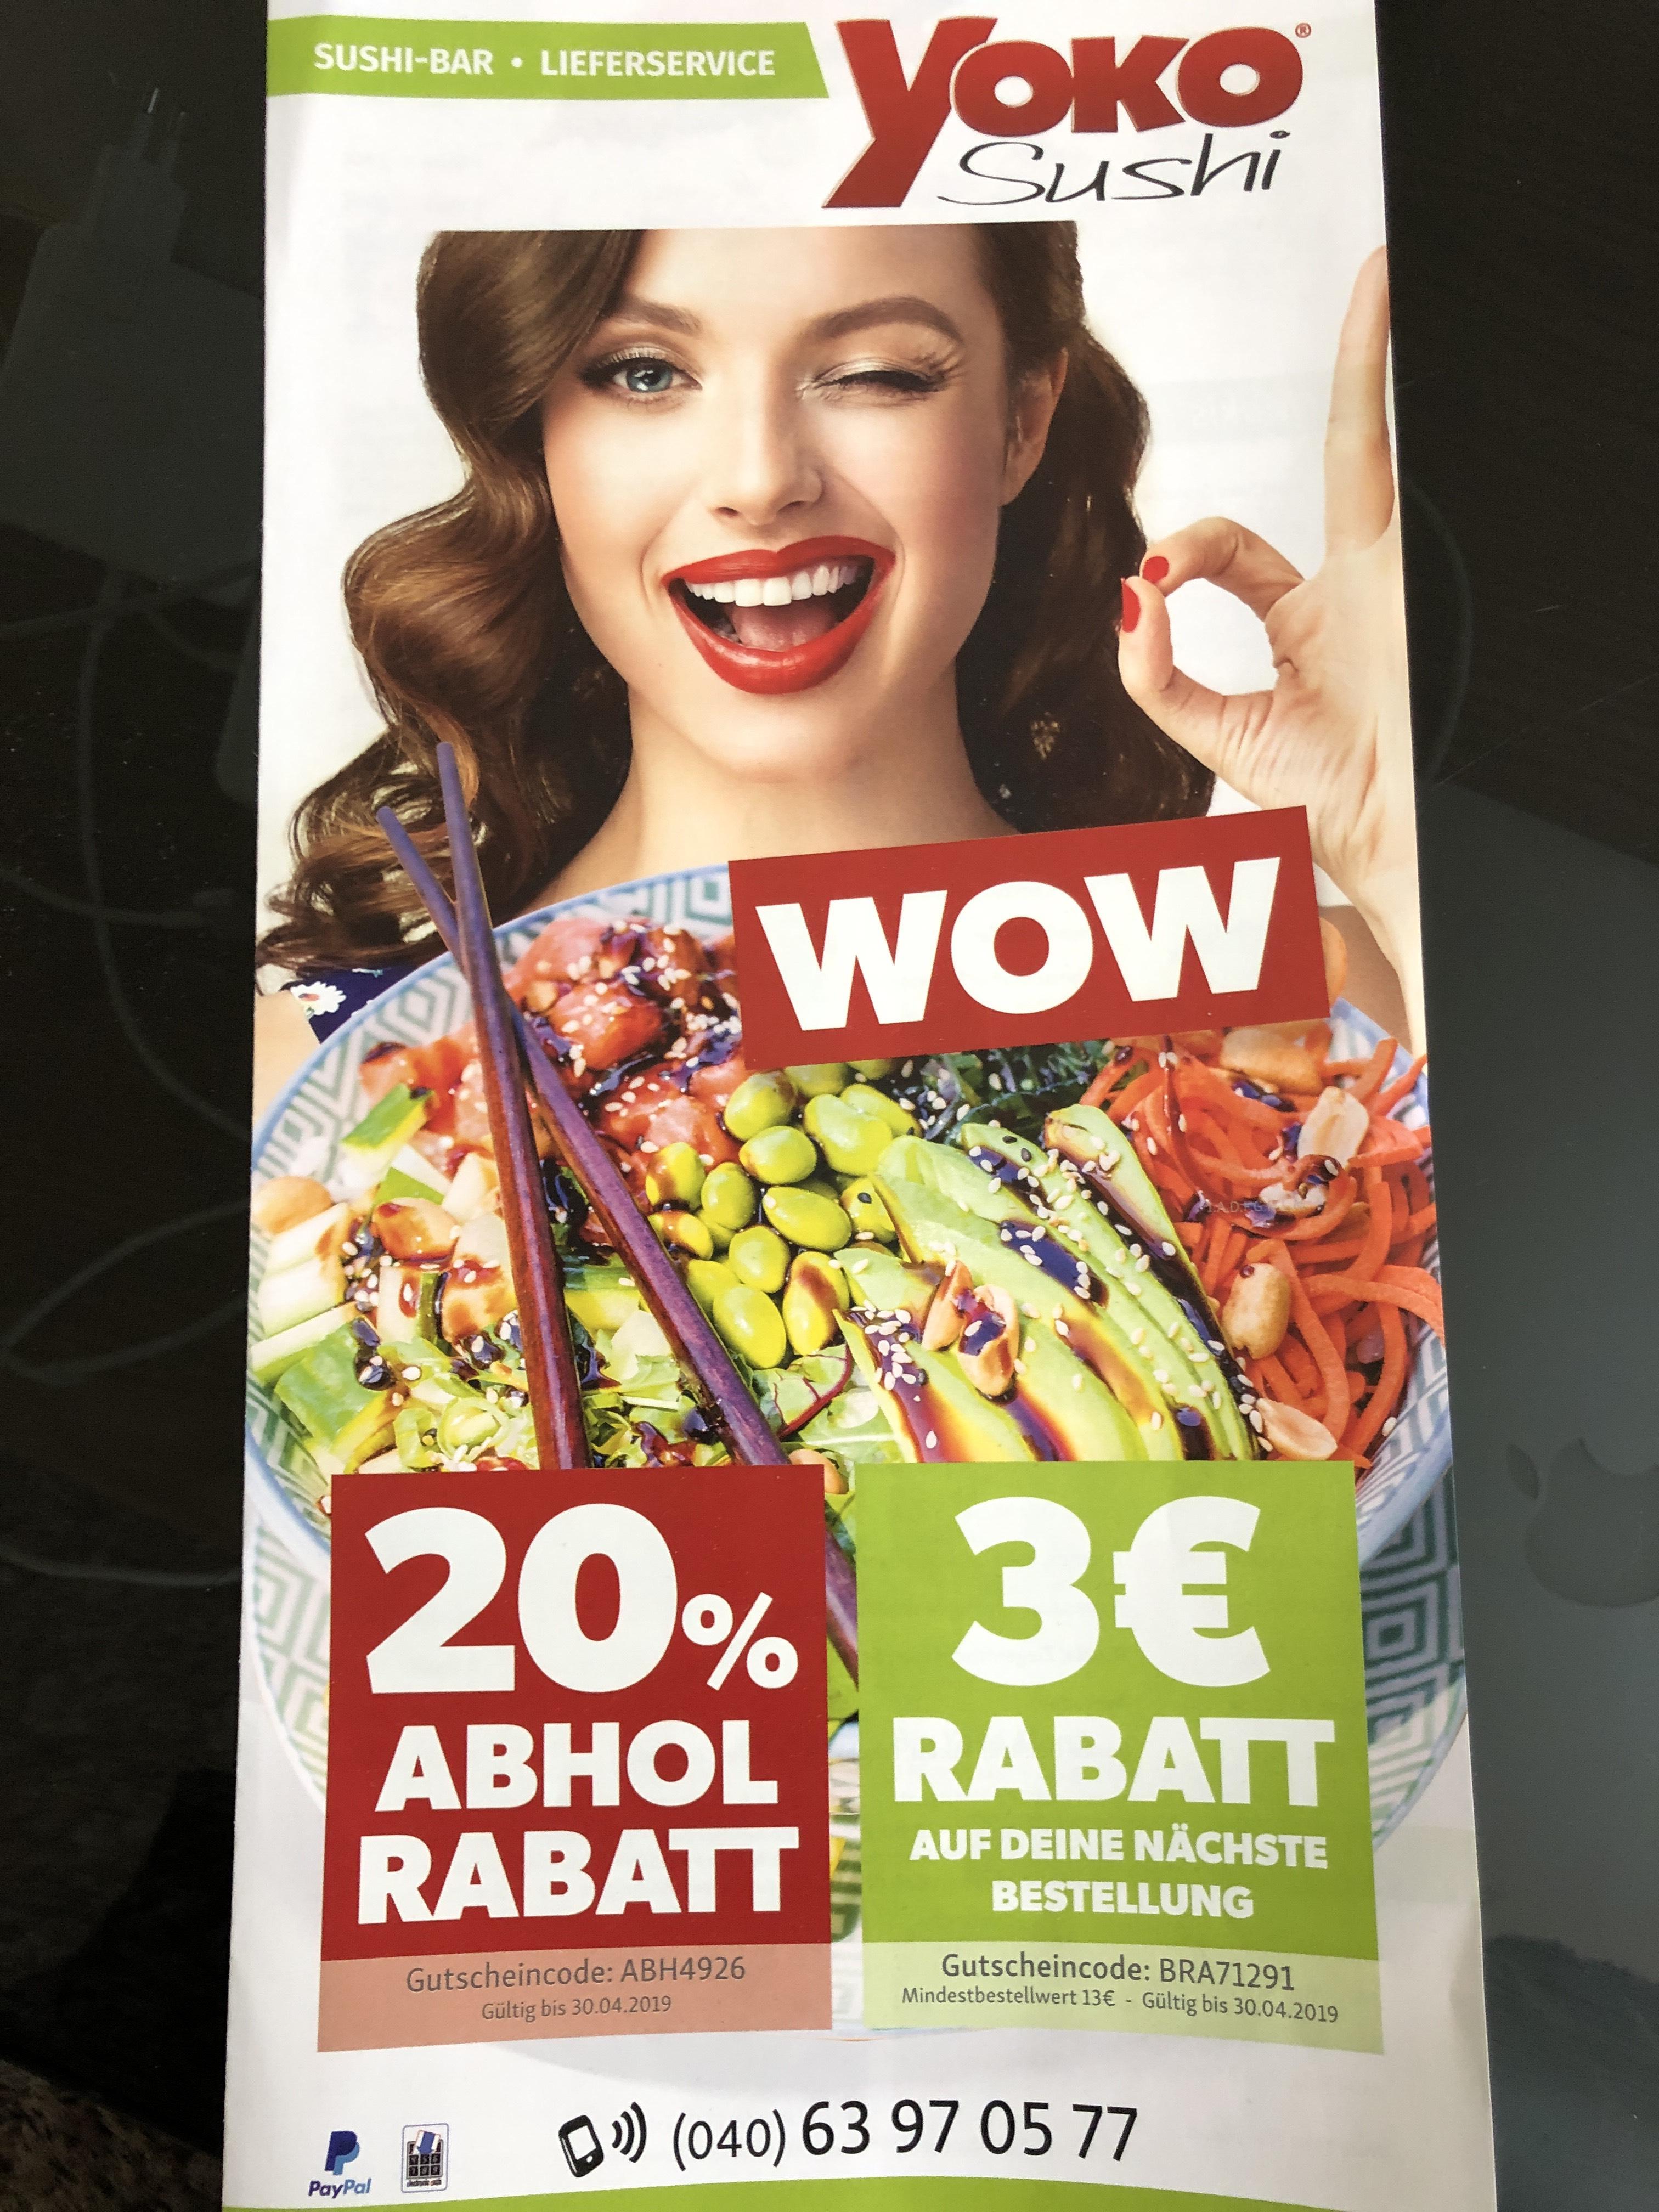 Yoko Sushi - 20% Abholrabatt - 3€ Rabatt - Lokal HH-Bramfeld